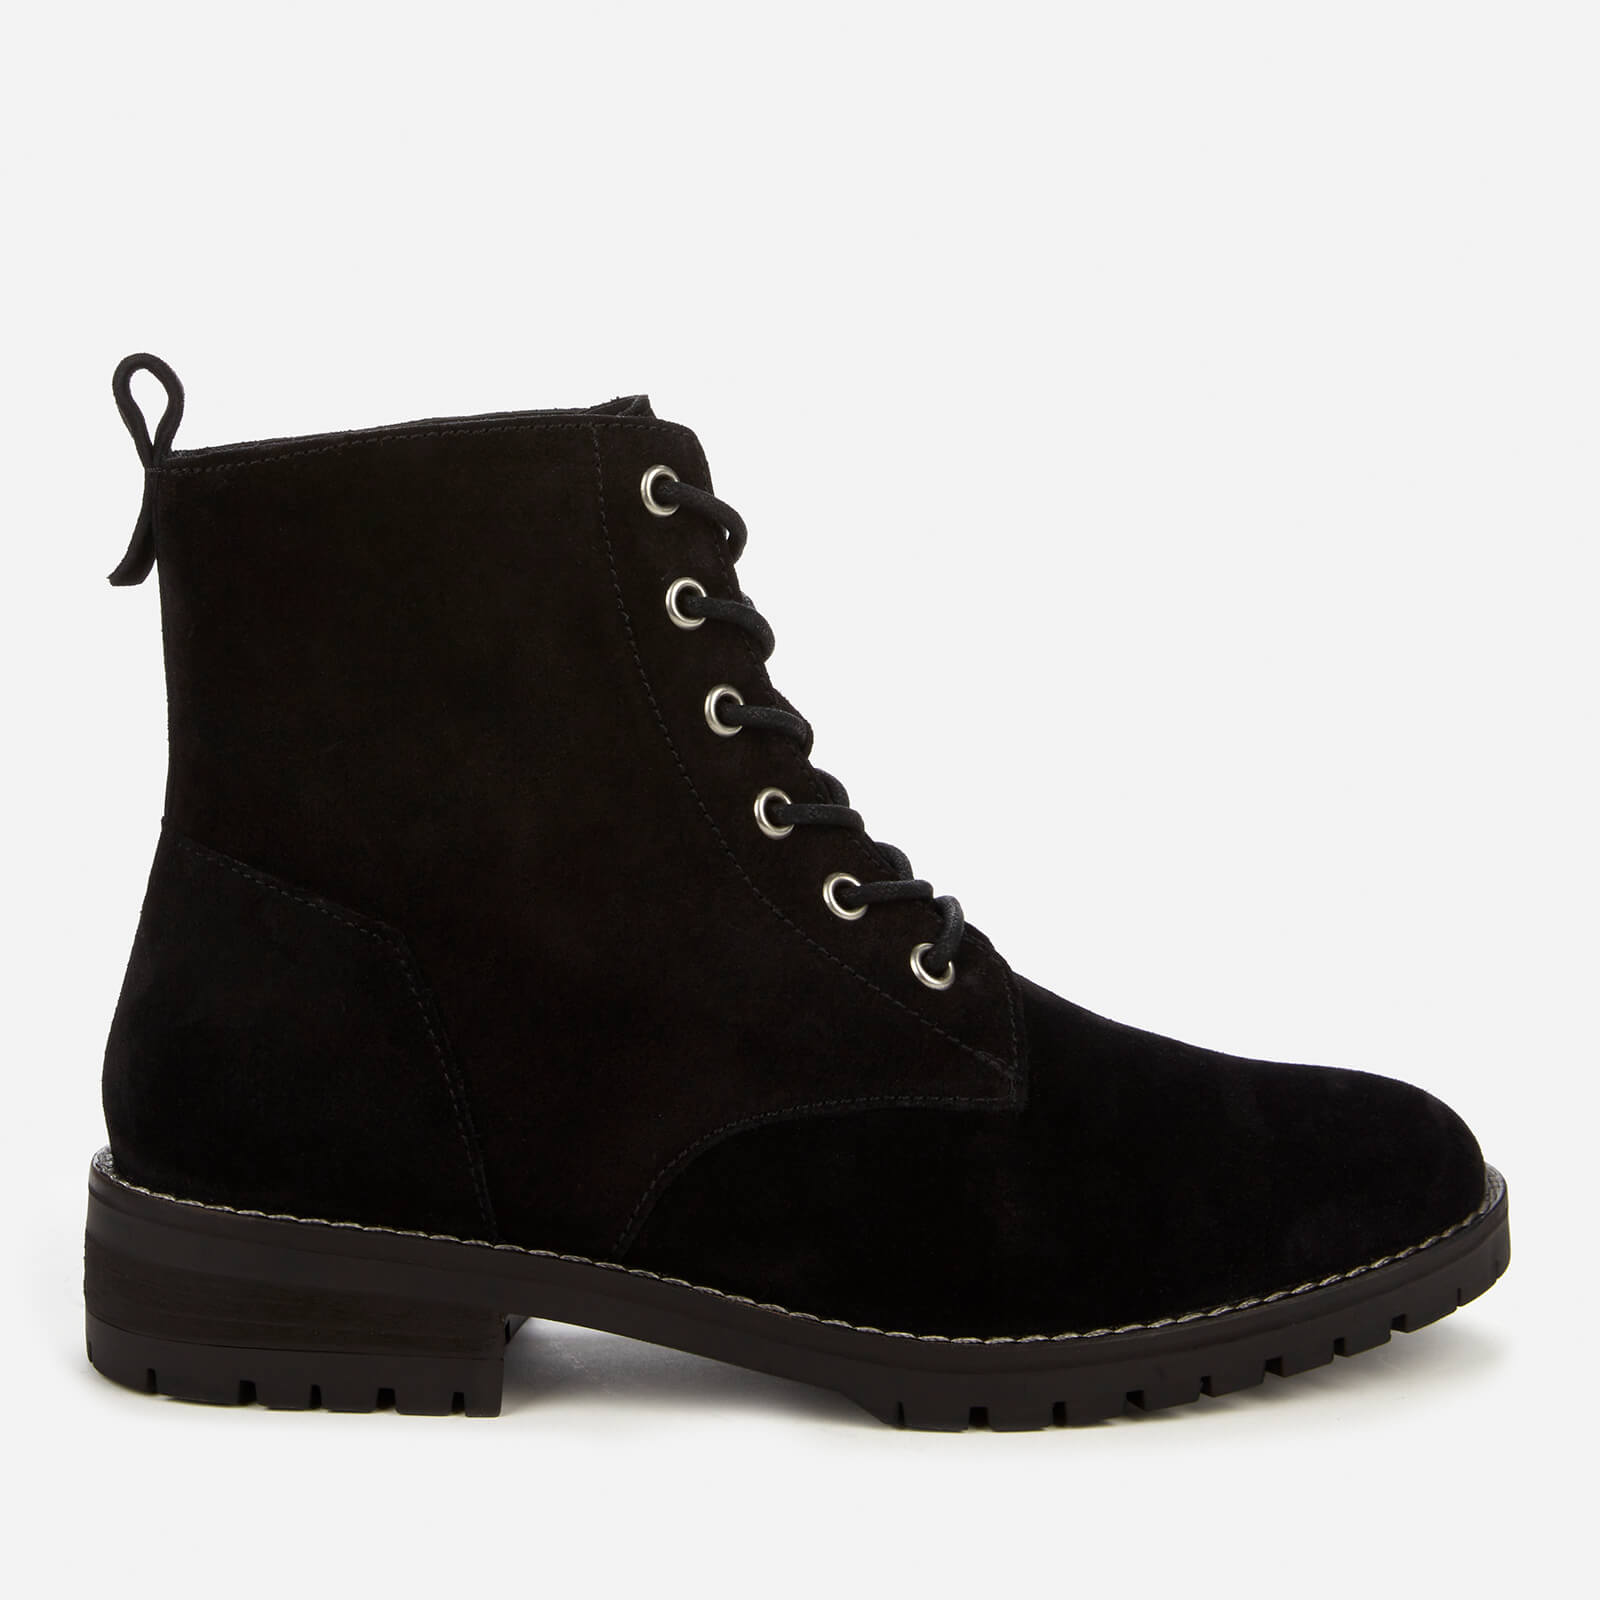 Superdry Women's Commando Lace Up Boots - Black - Uk 6